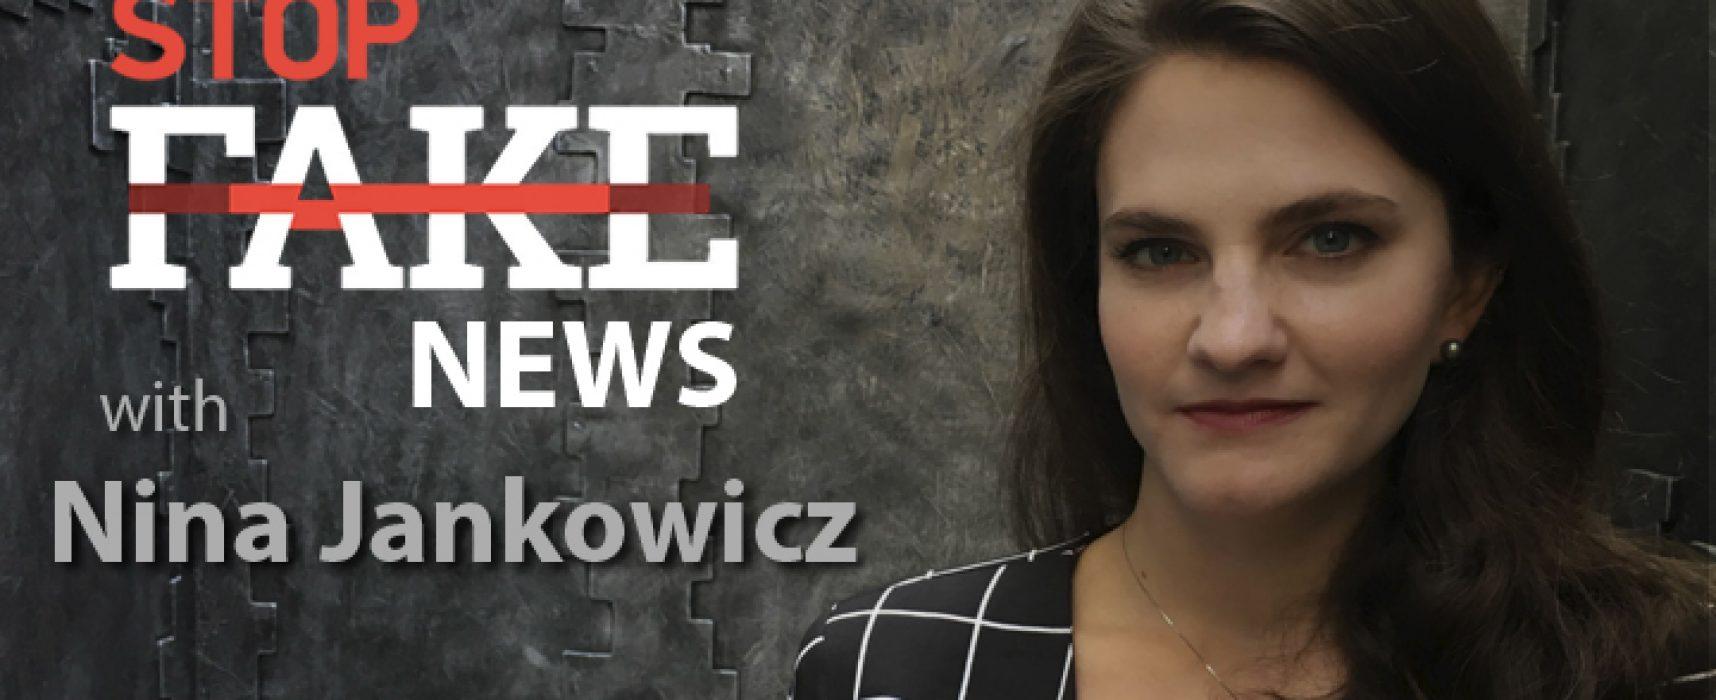 StopFakeNews #117 with Nina Jankowicz